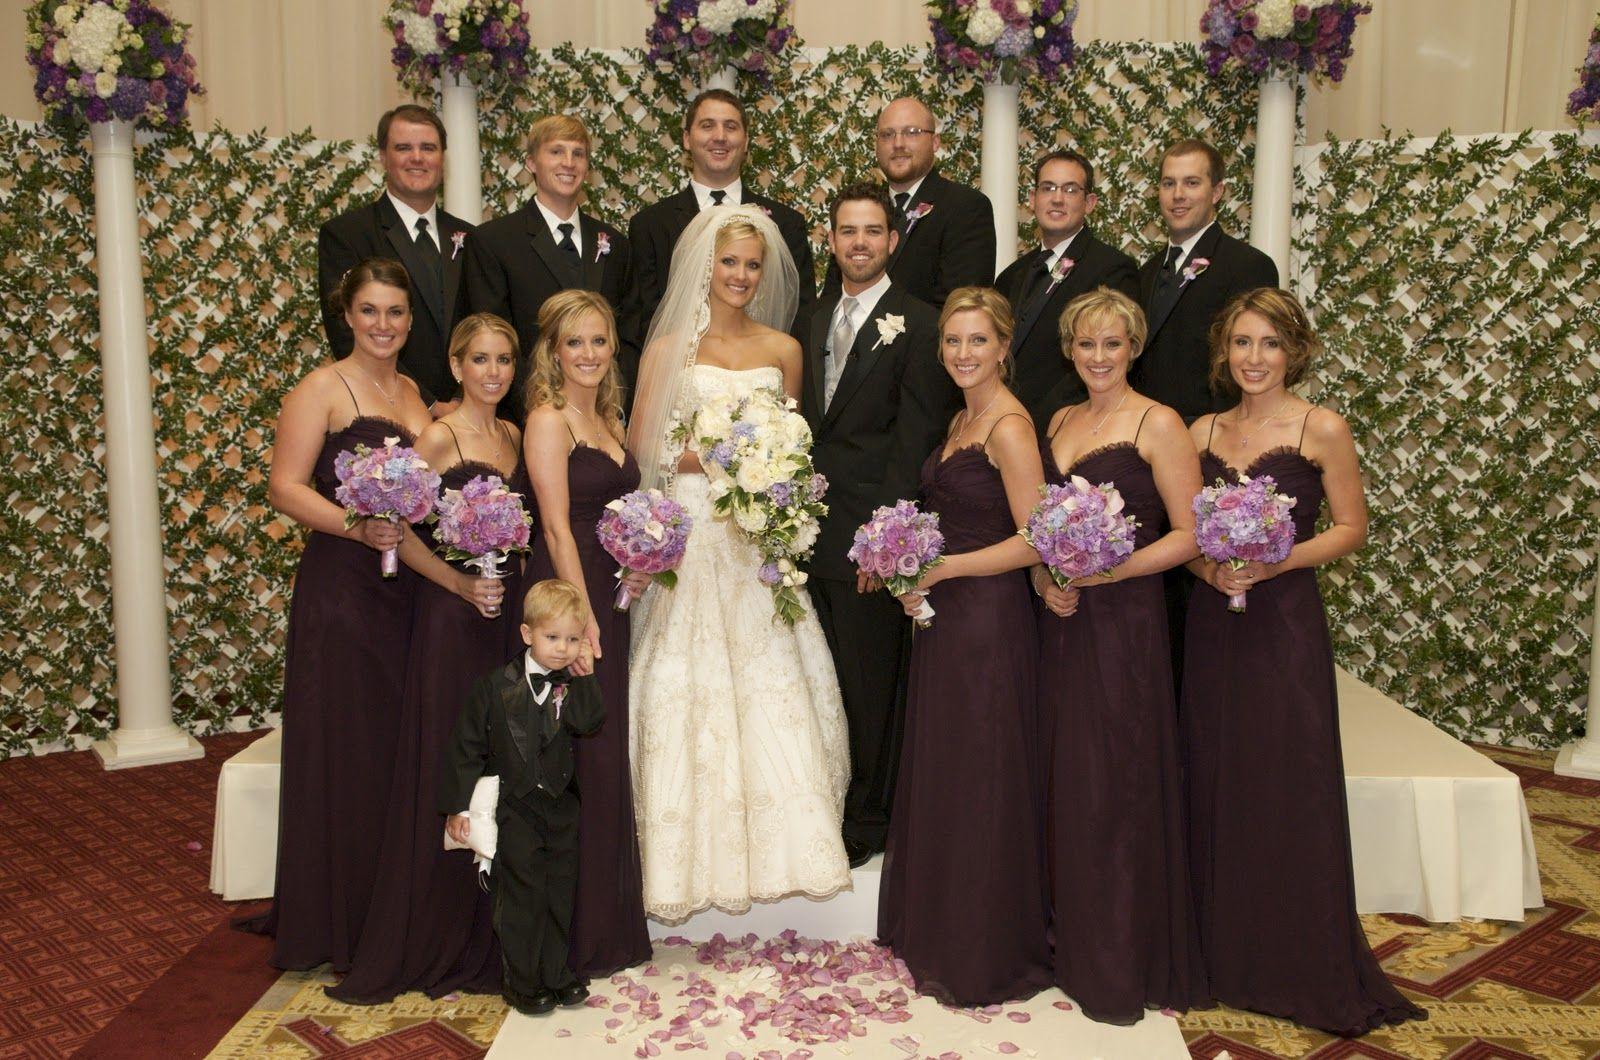 Wedding dress with eggplant bridesmaids dresses | Wedding Ideas ...